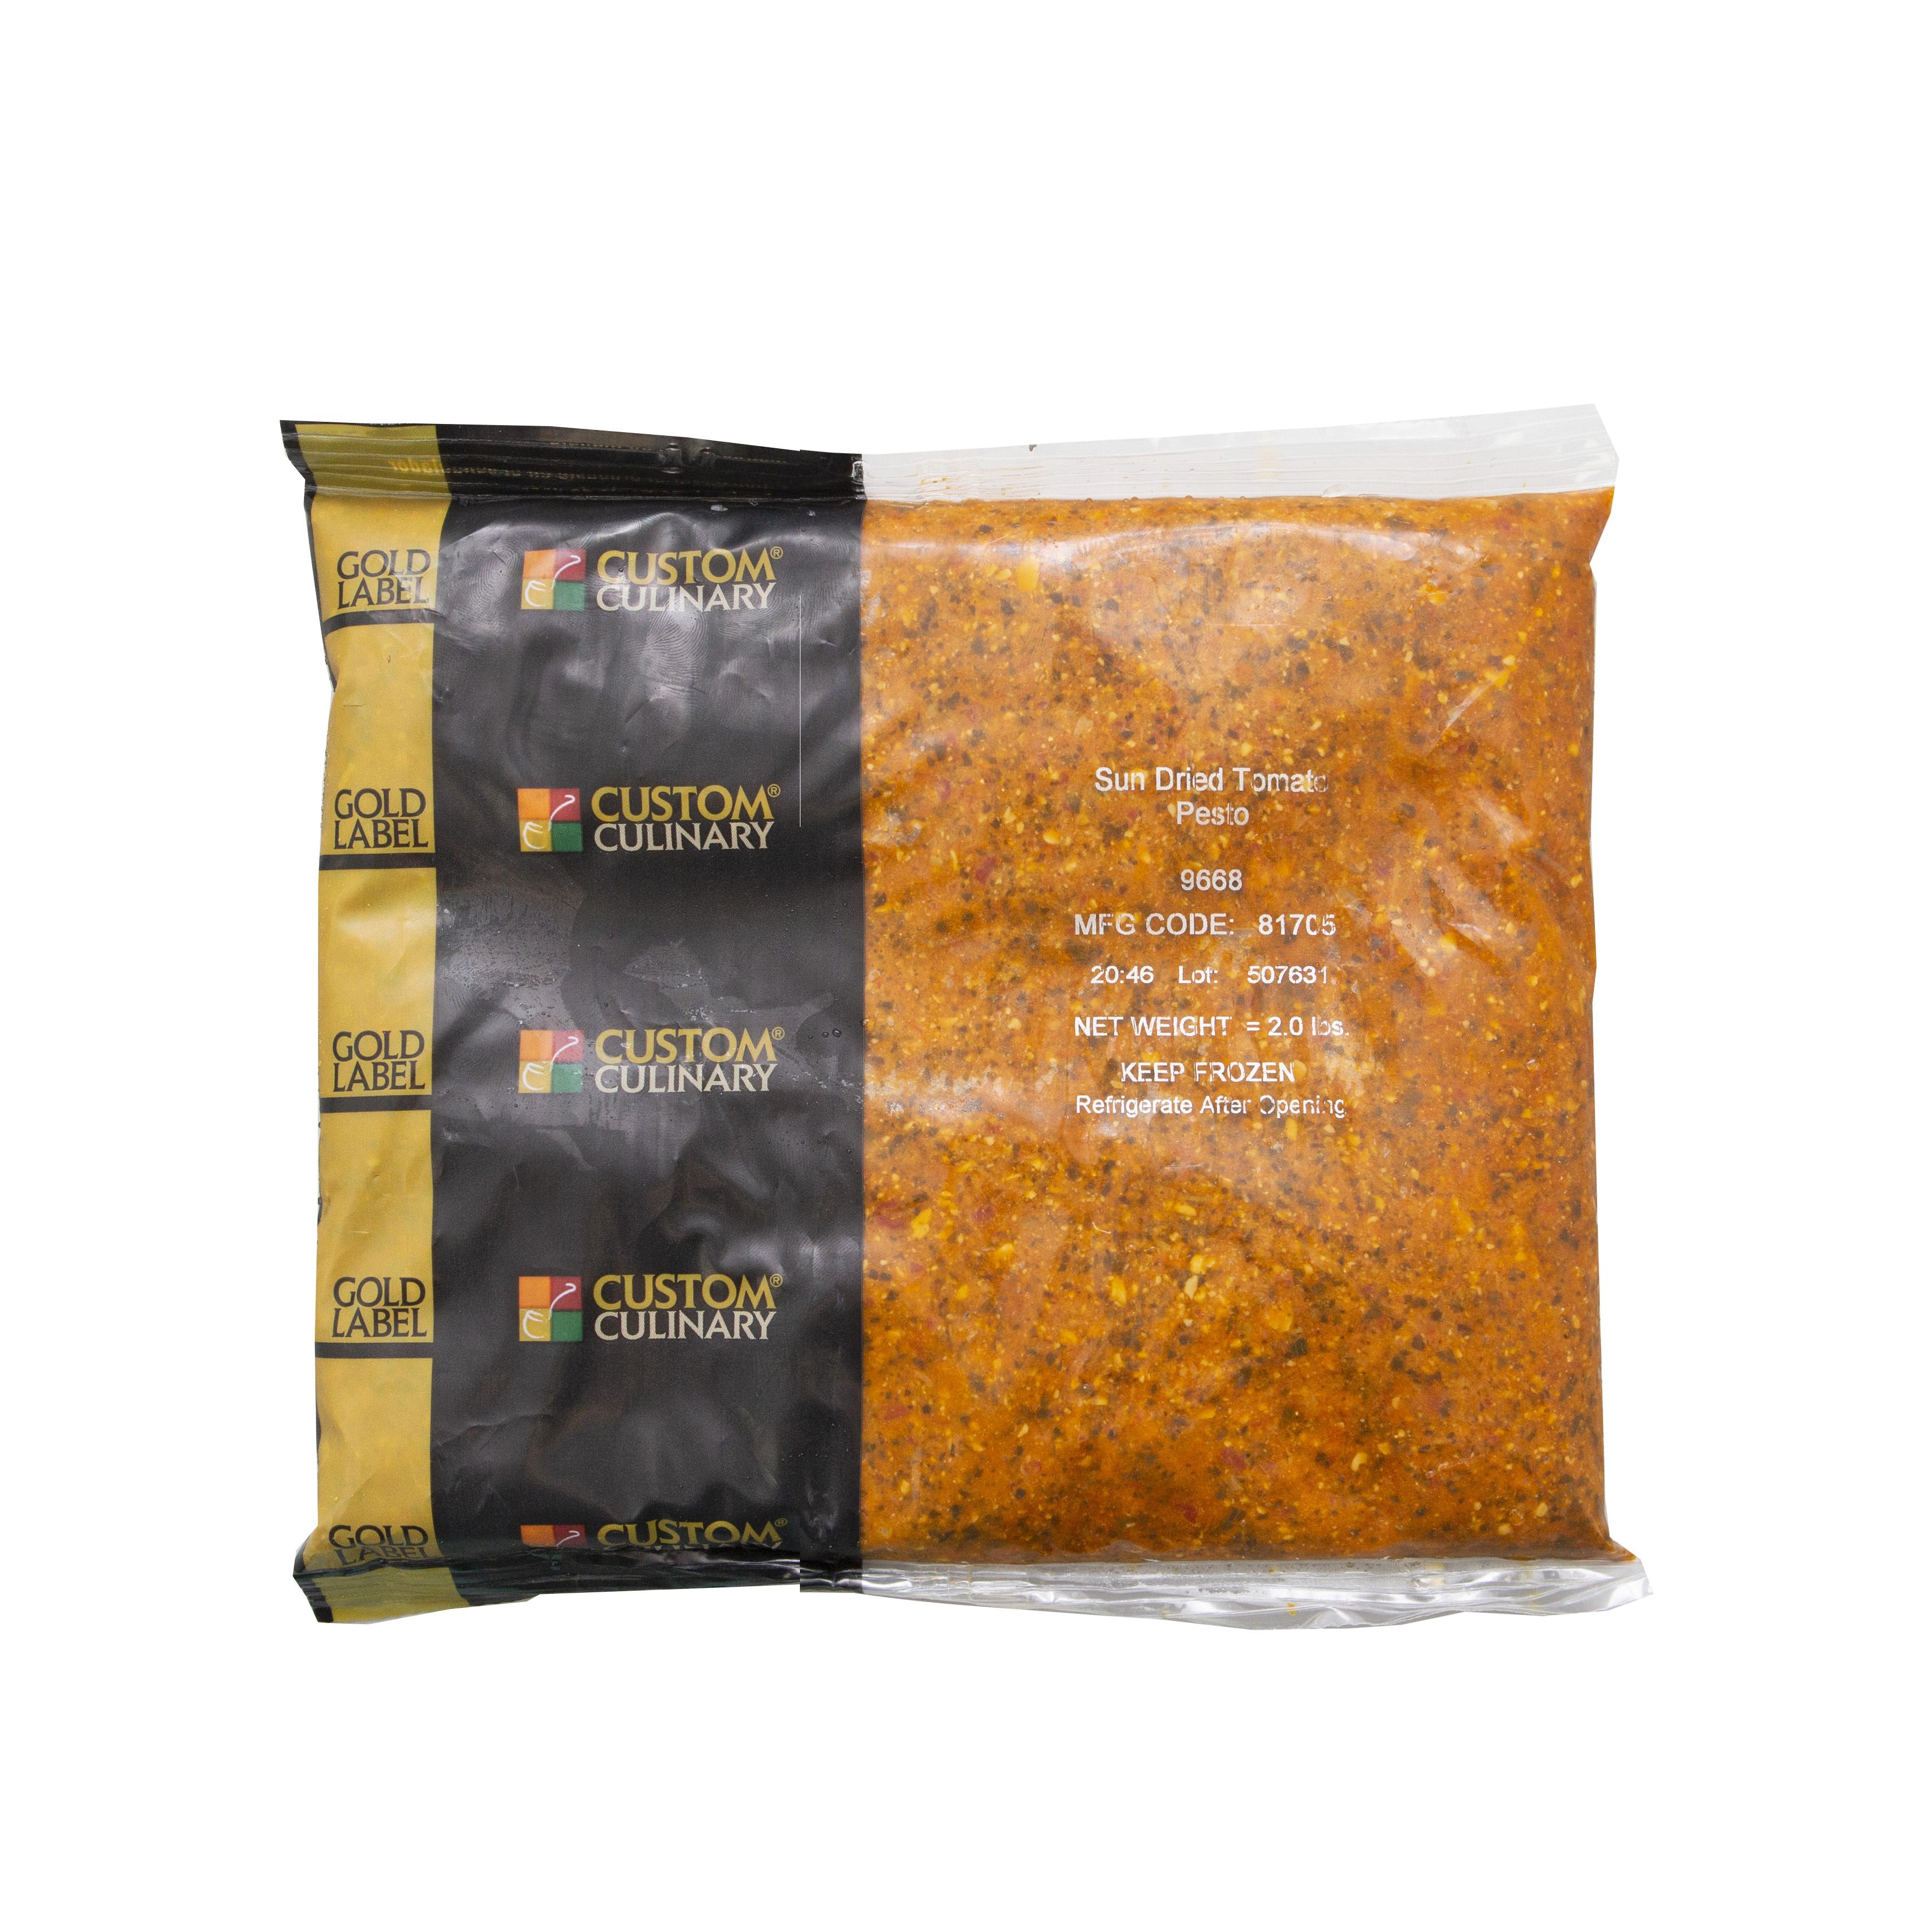 9668 - GOLD LABEL Ready-To-Use Frozen Sundried Tomato Pesto Sauce